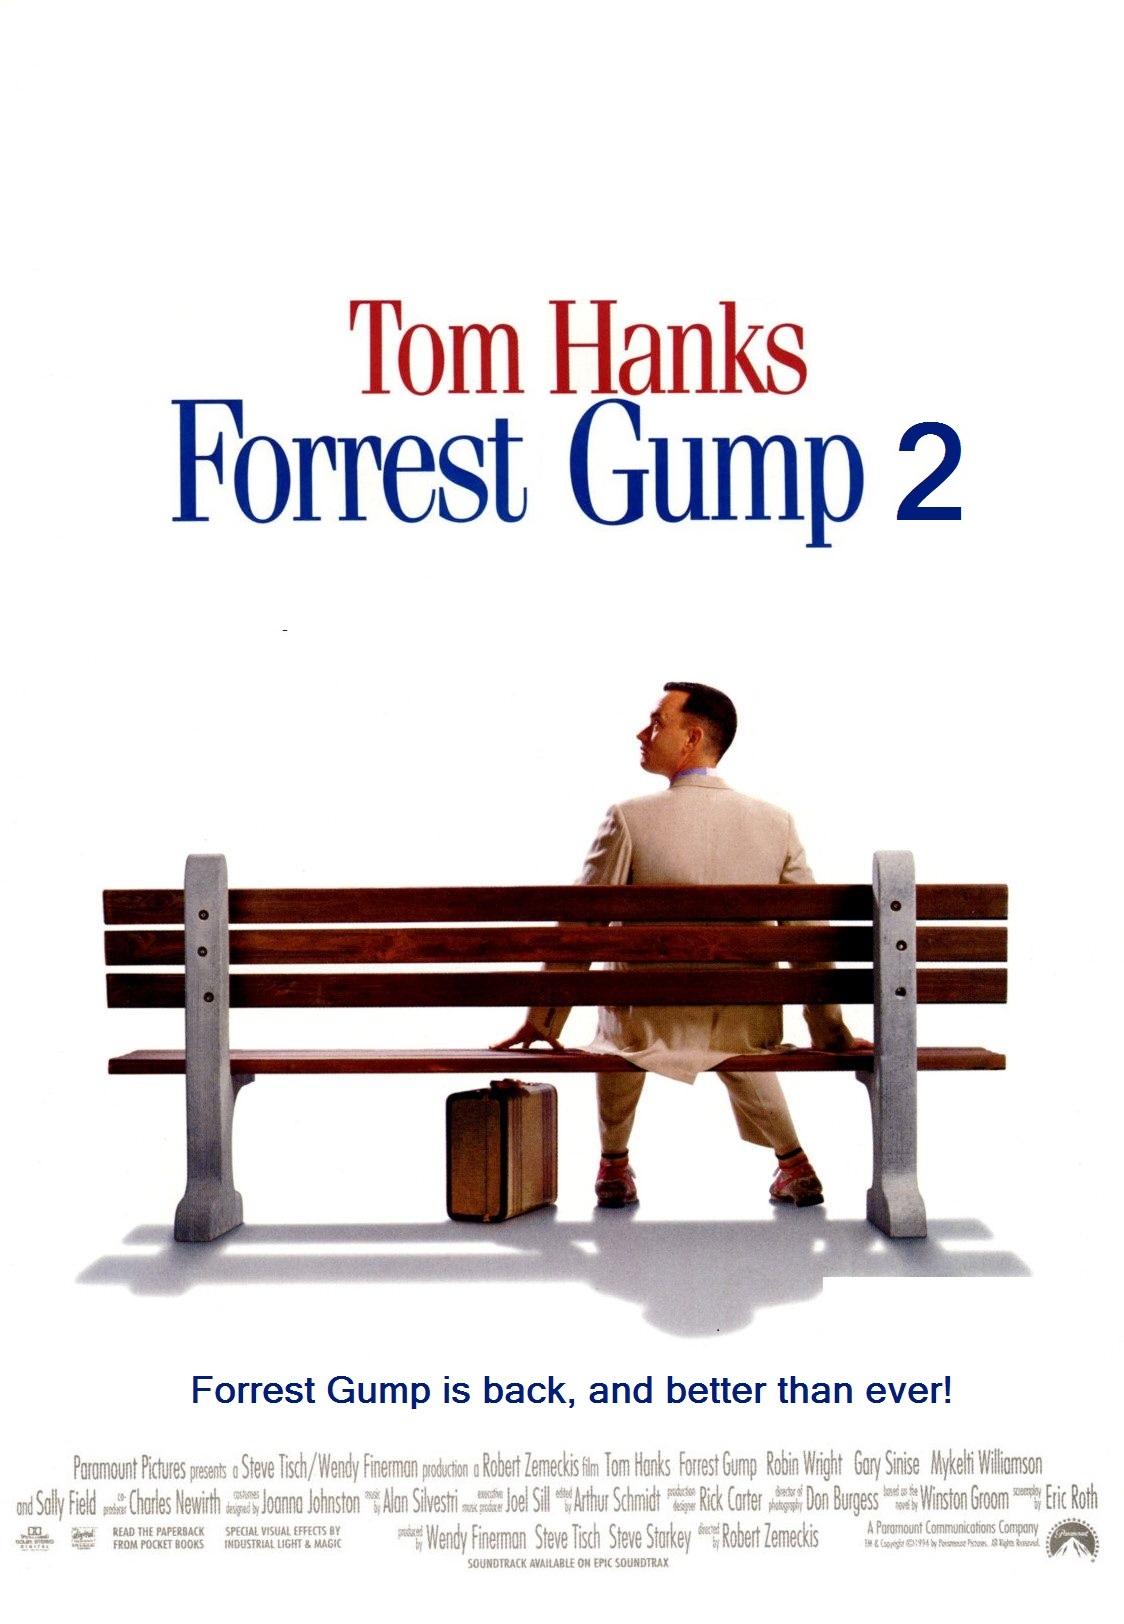 Forrest Gump 2 | Idea Wiki | FANDOM powered by Wikia